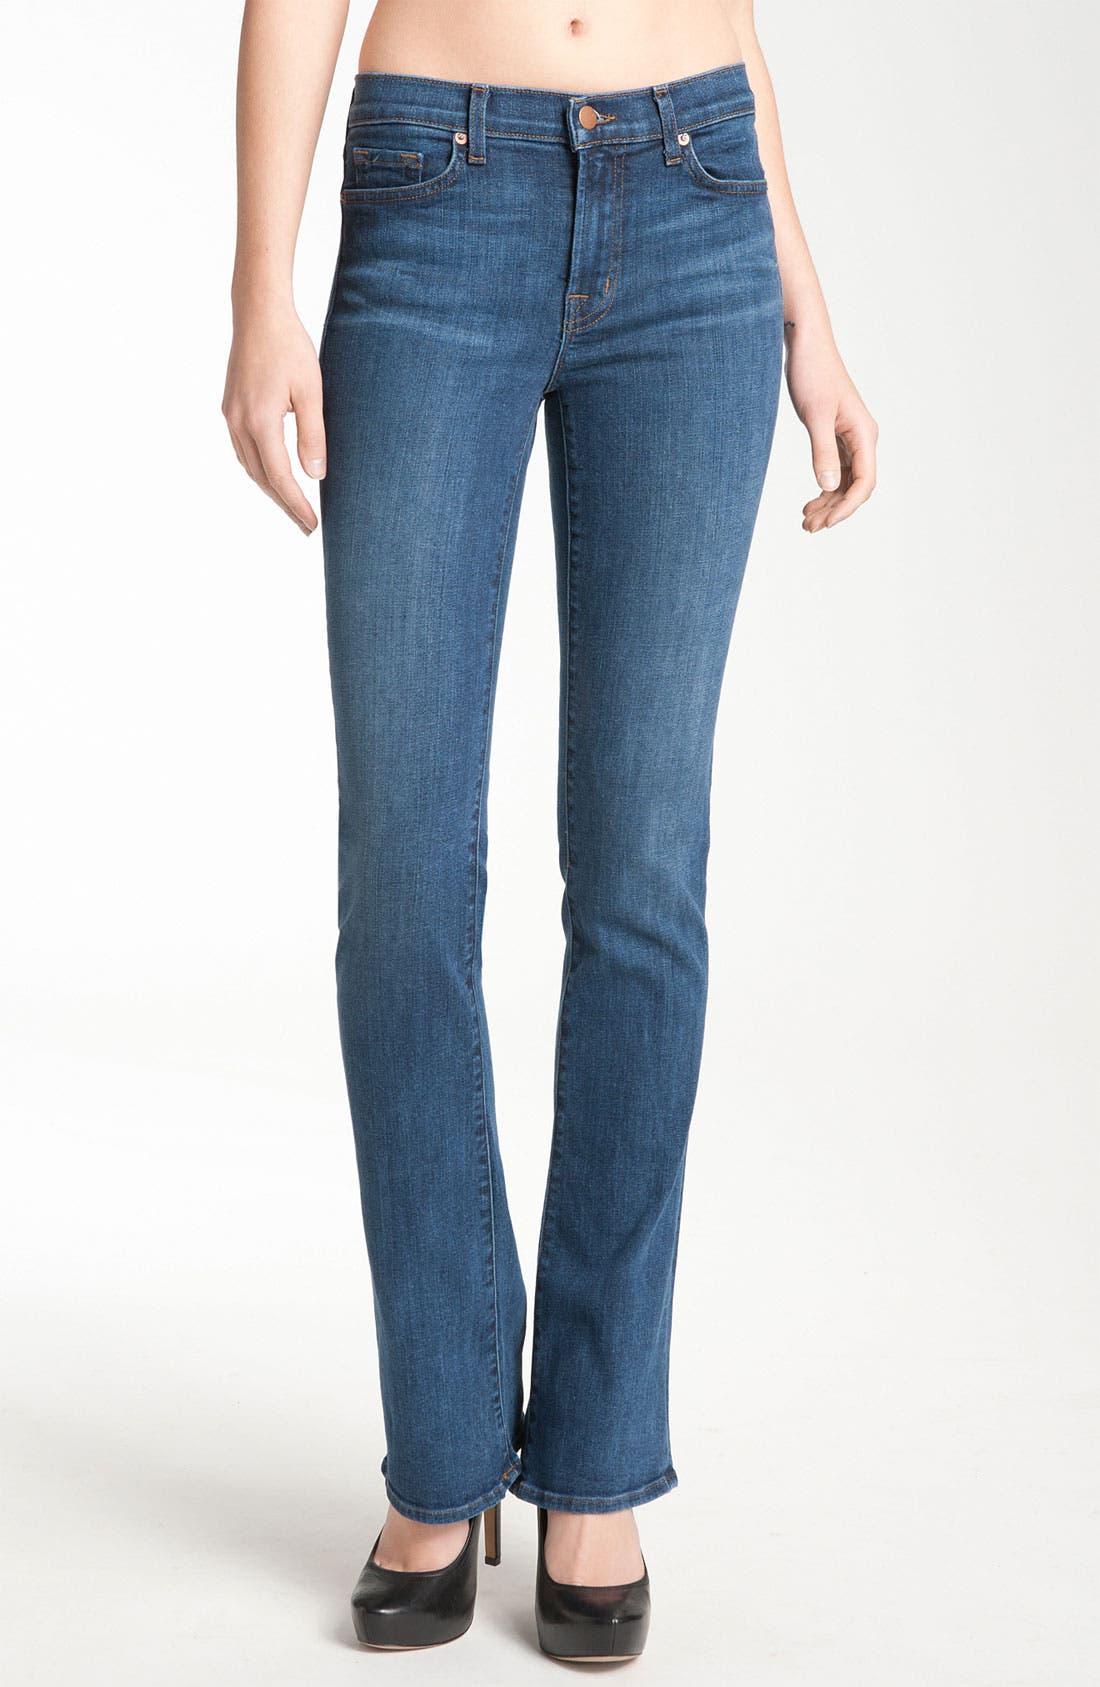 Alternate Image 1 Selected - J Brand 'Janey' Super Slim Bootcut Jeans (Bluebell Wash)